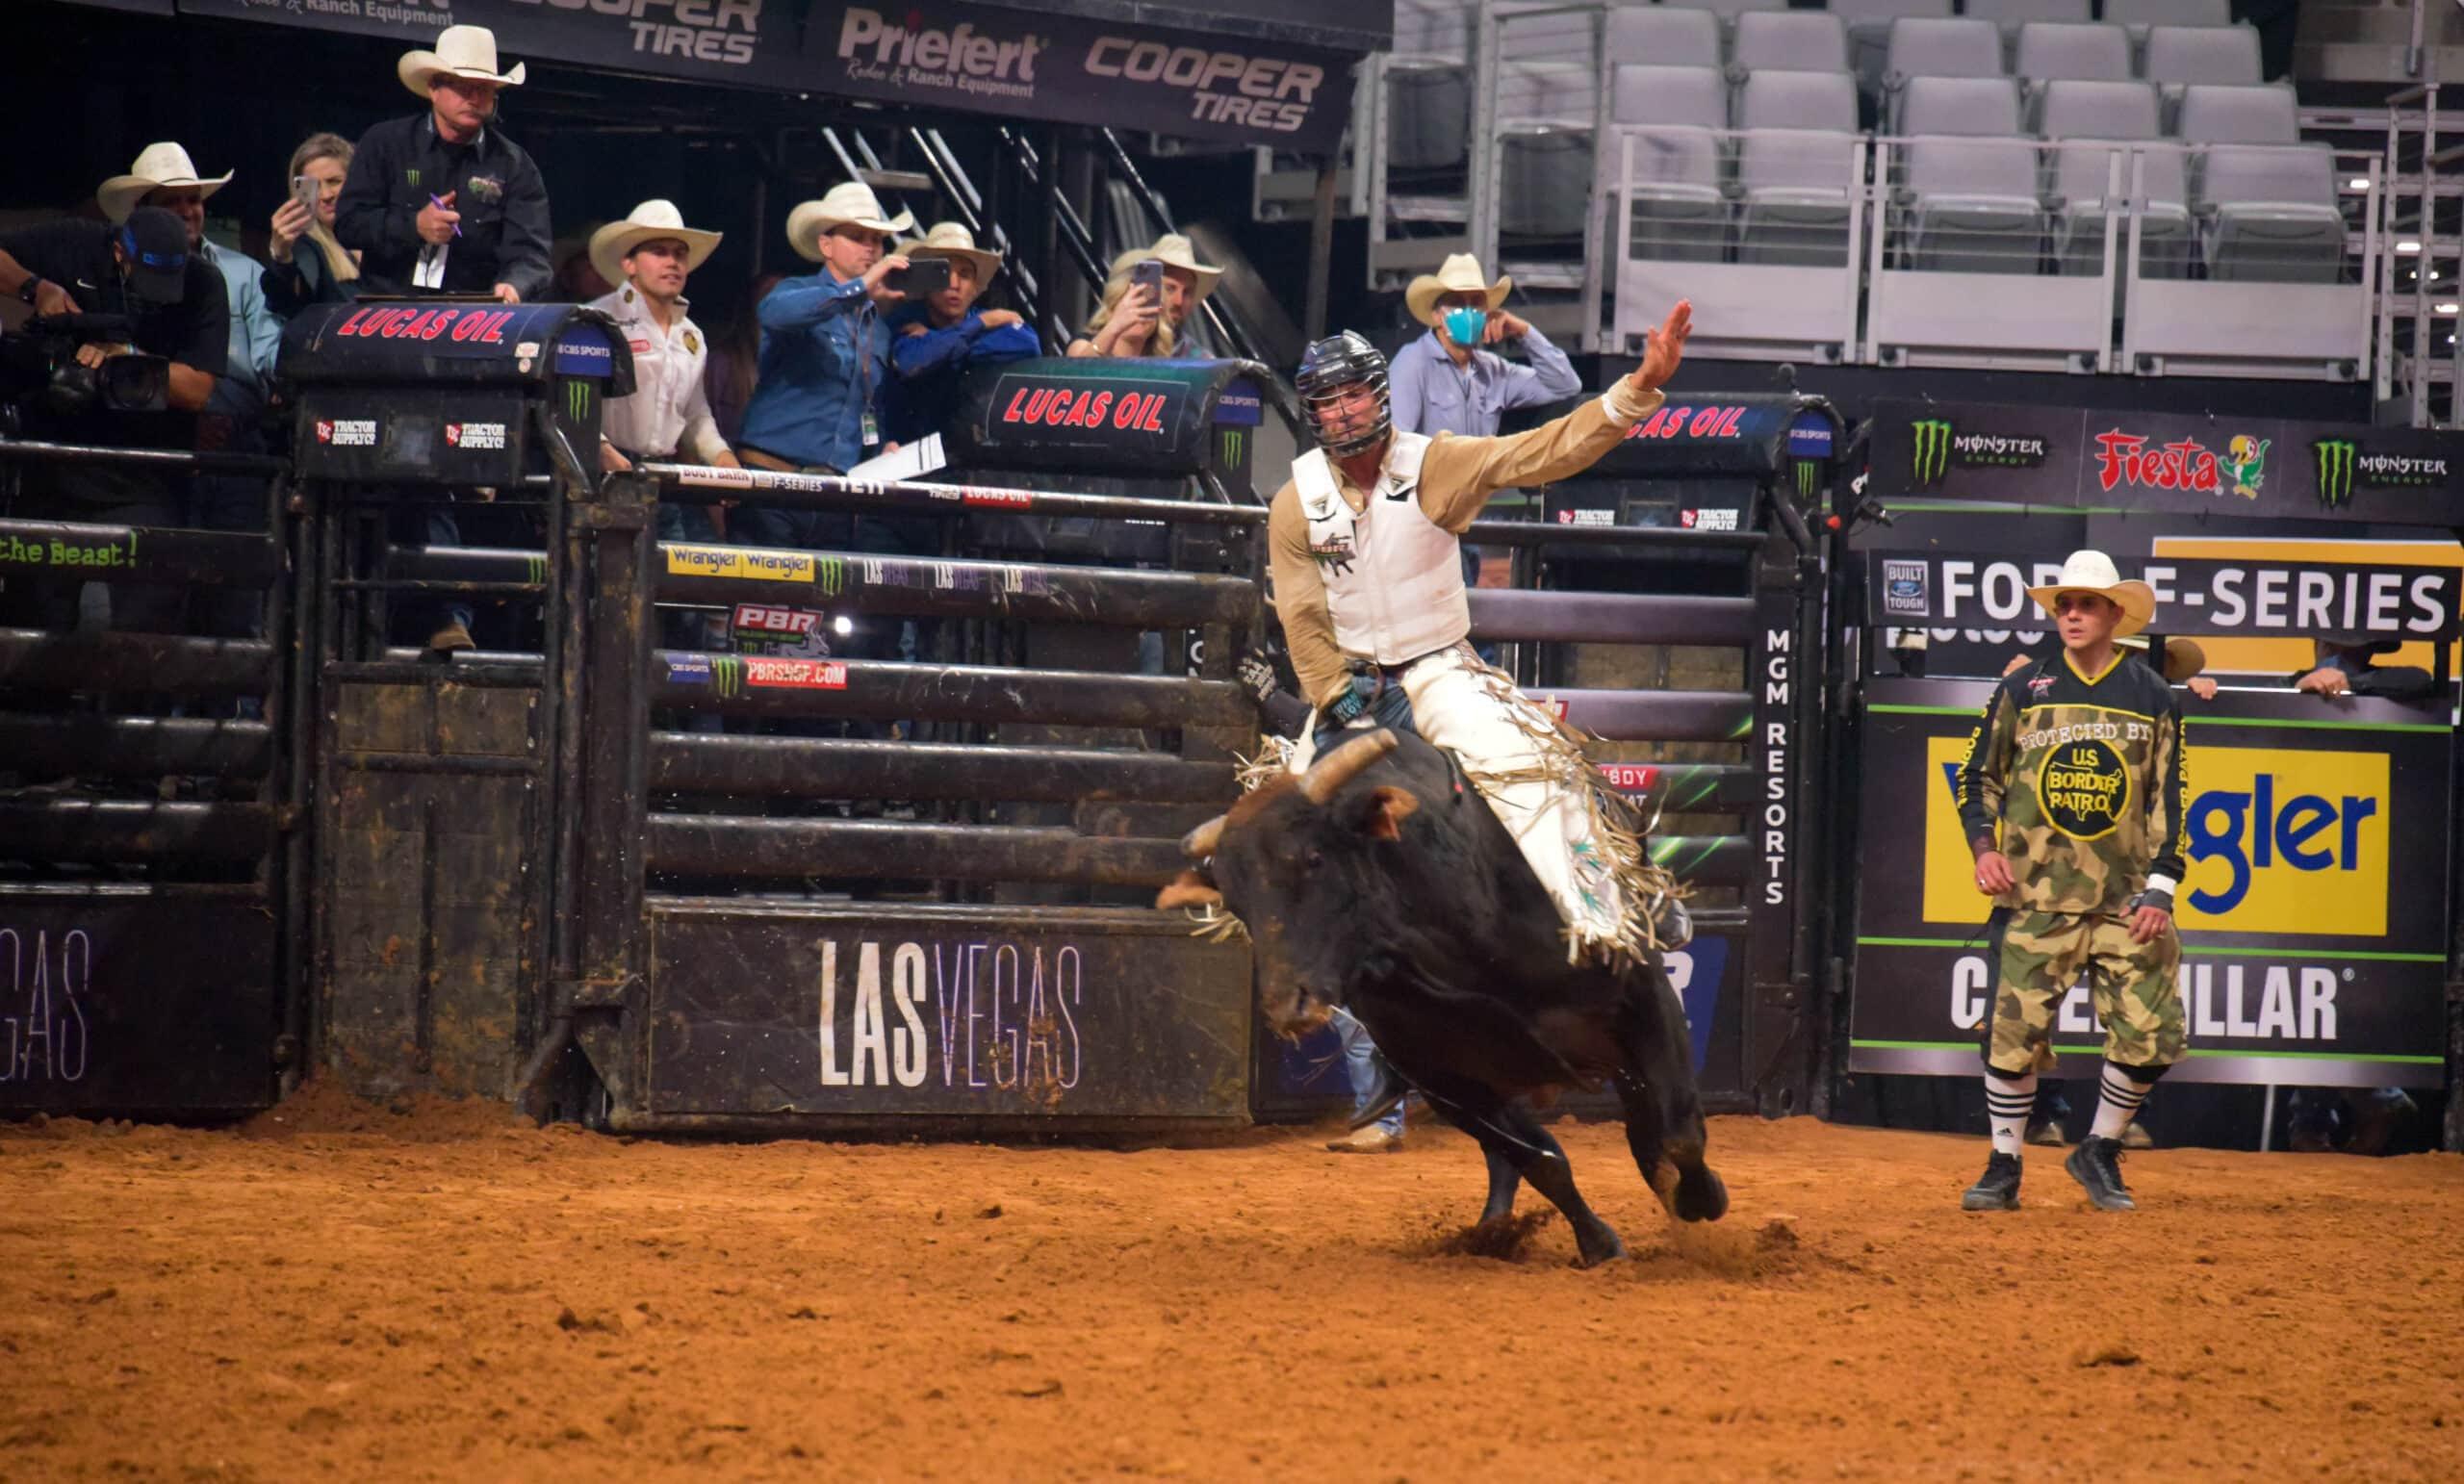 Vastbinder riding a black bull